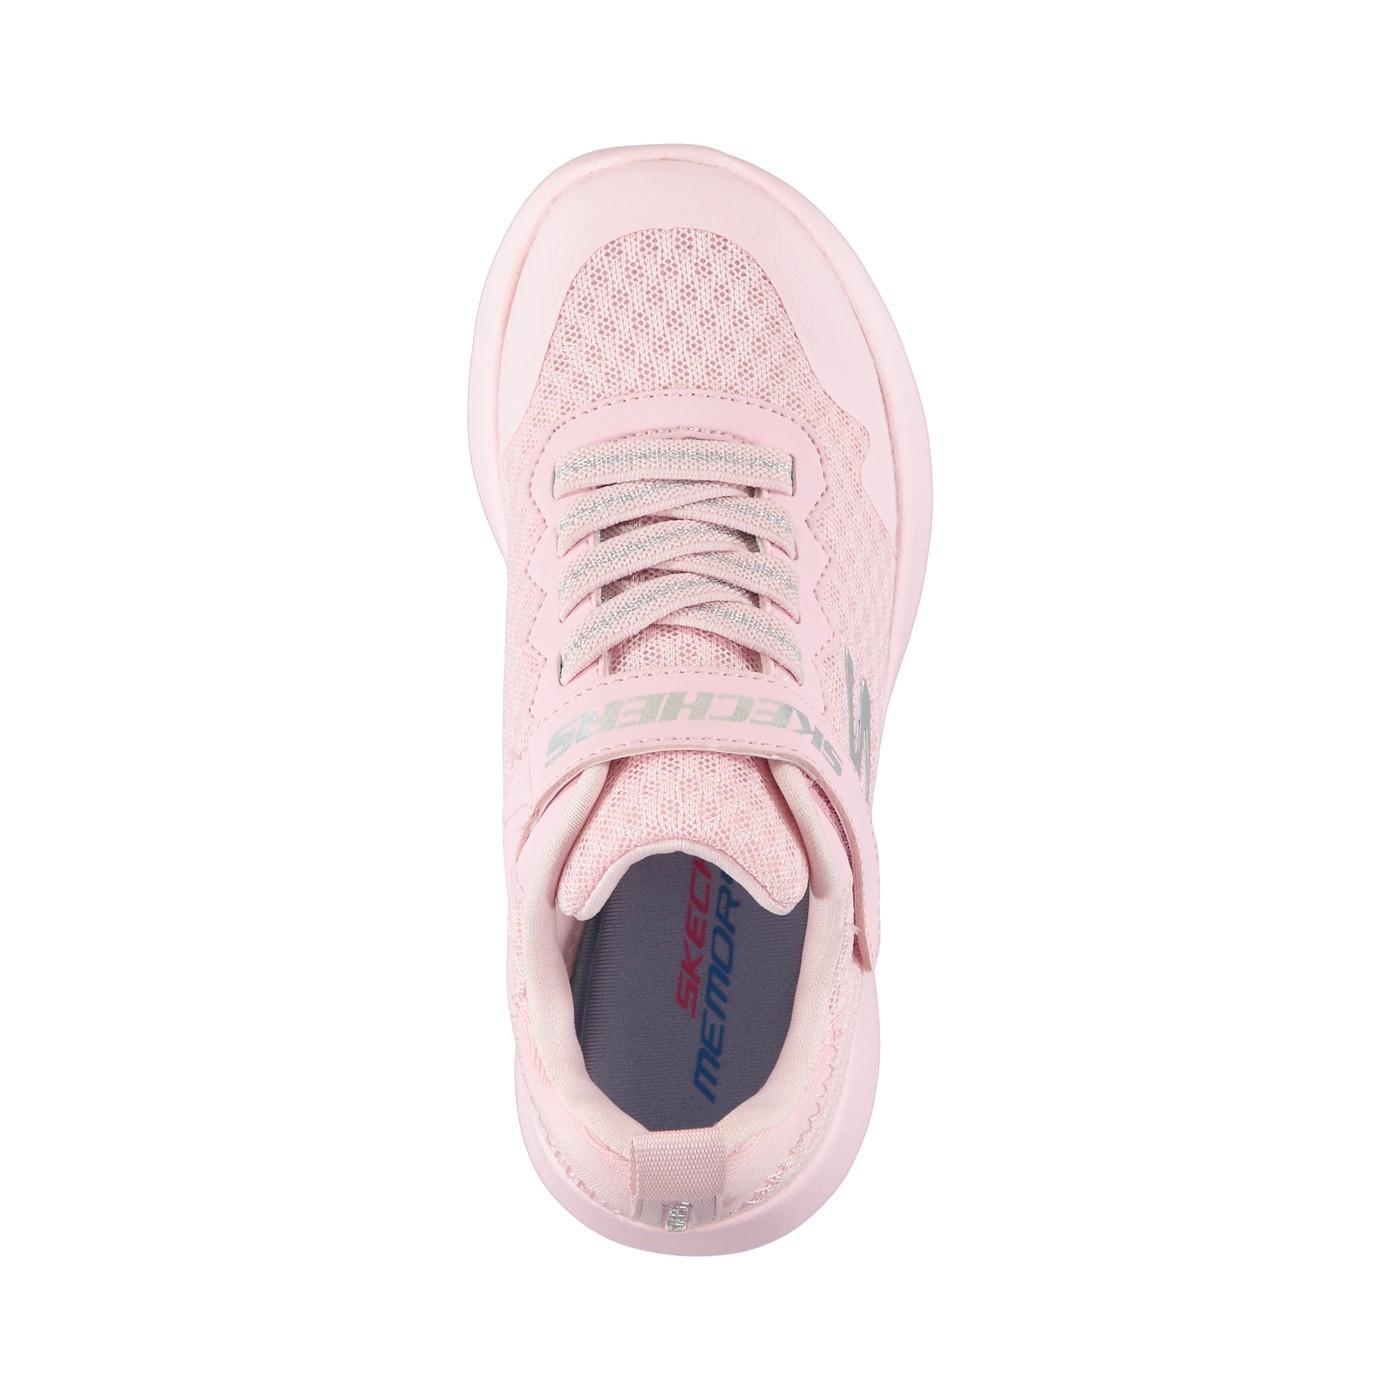 Skechers Dynamight Çocuk Pembe Spor Ayakkabı